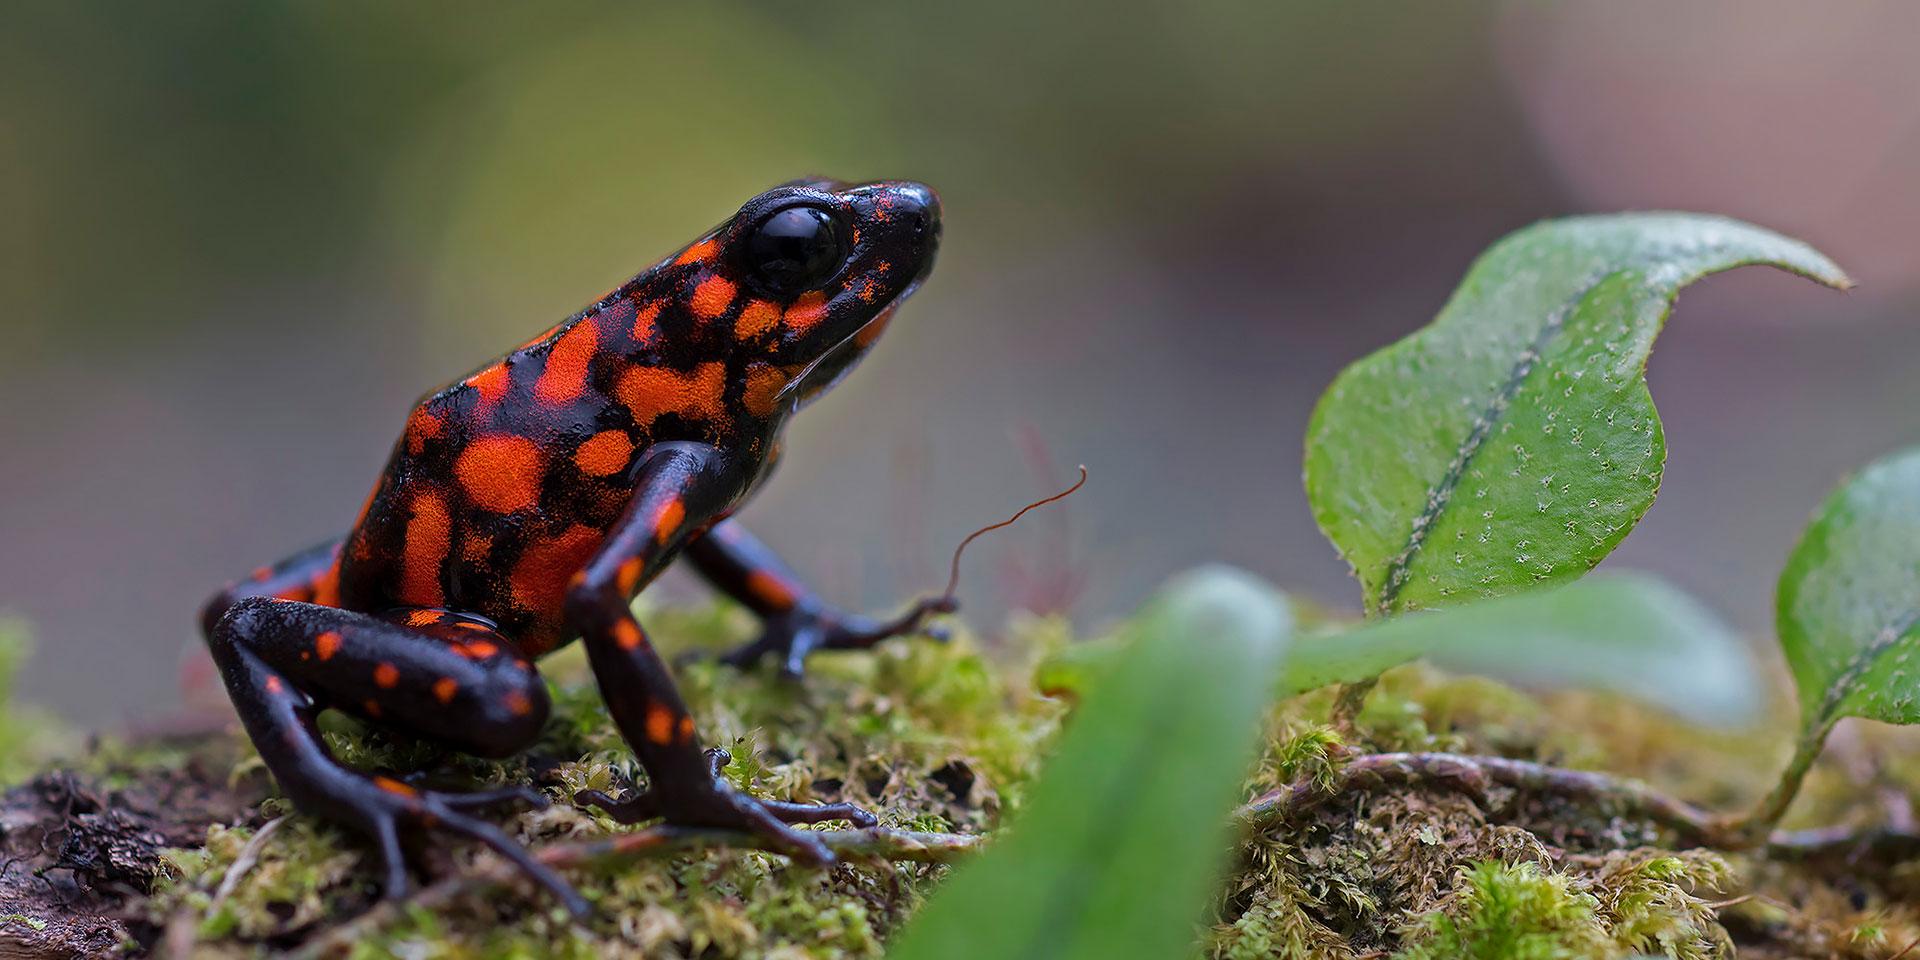 Neoselva-Oophaga-sylvatica-poisonfrog-Choco-Herping-Website